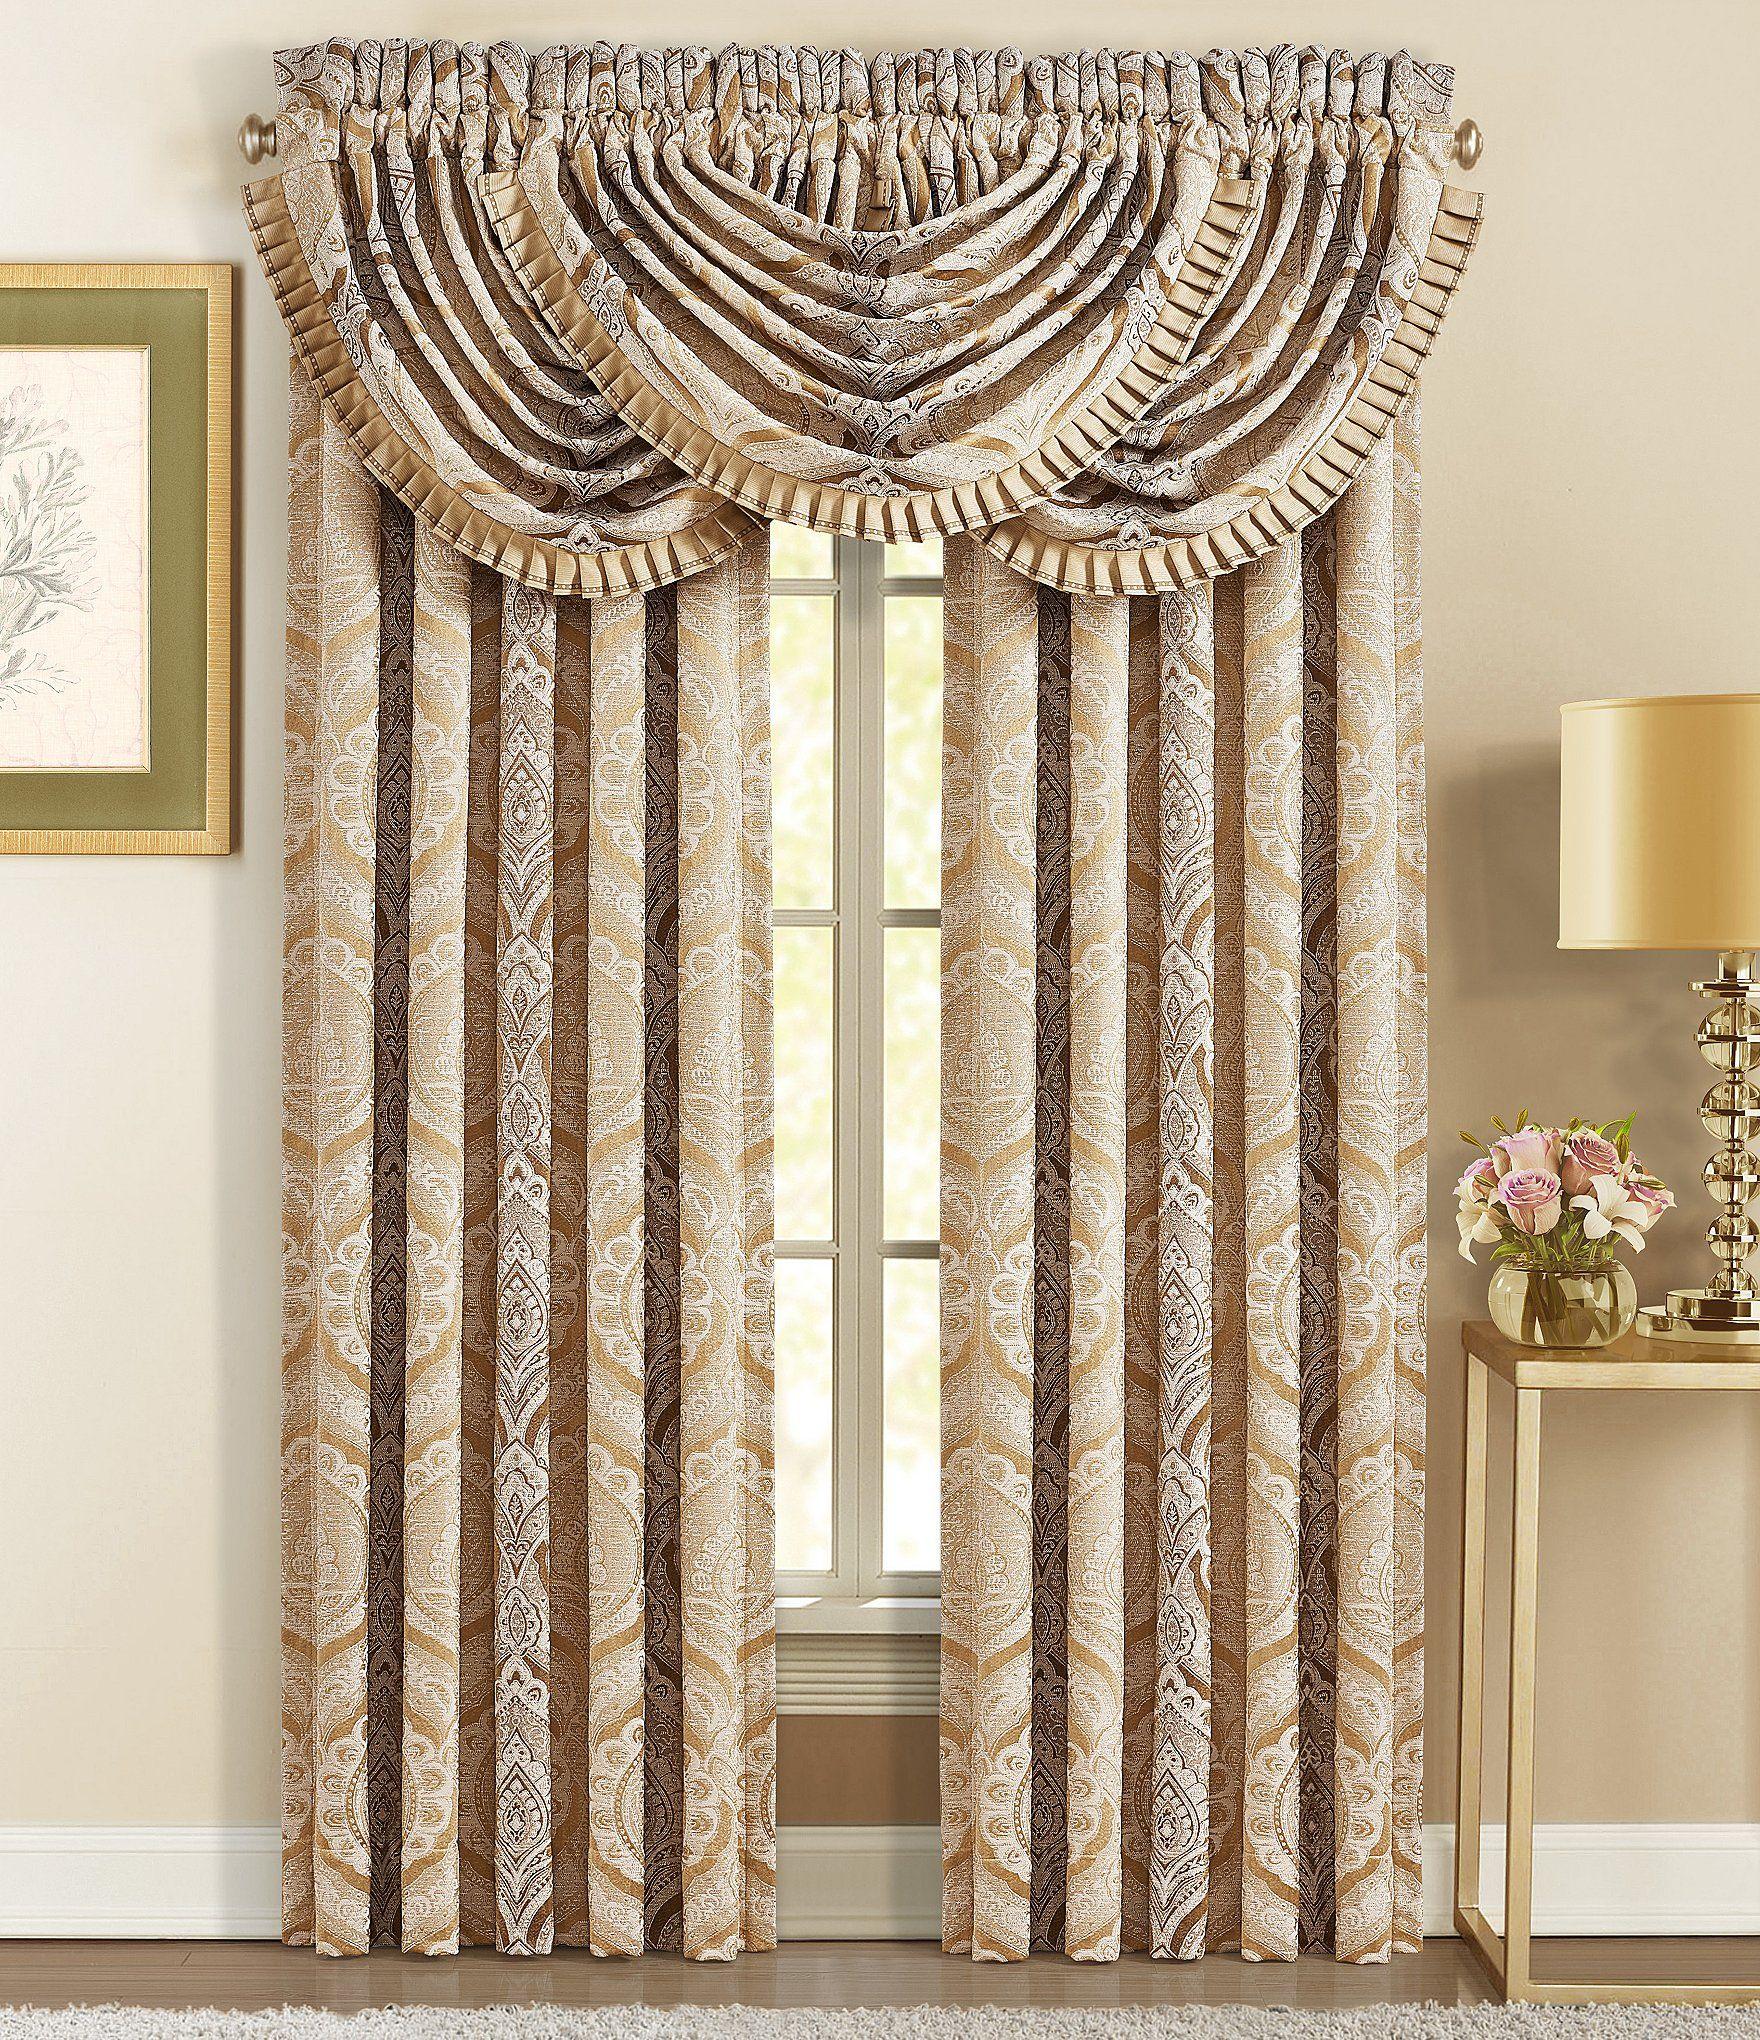 J. Queen New York Gianna Gold Window Treatments   Dillard's #windowtreatments